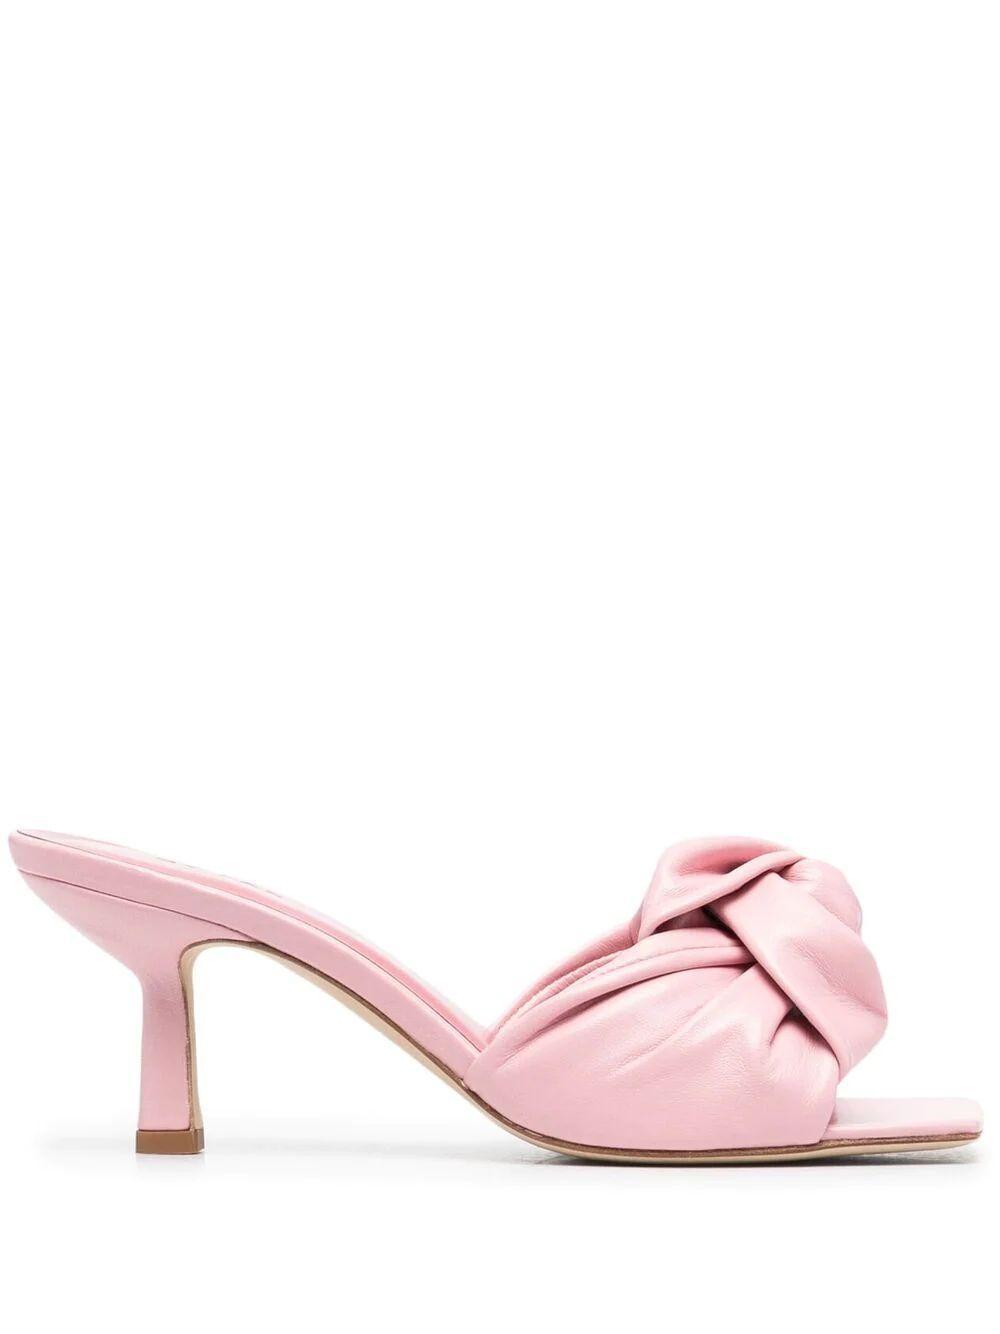 Lana Peony Gloss Leather